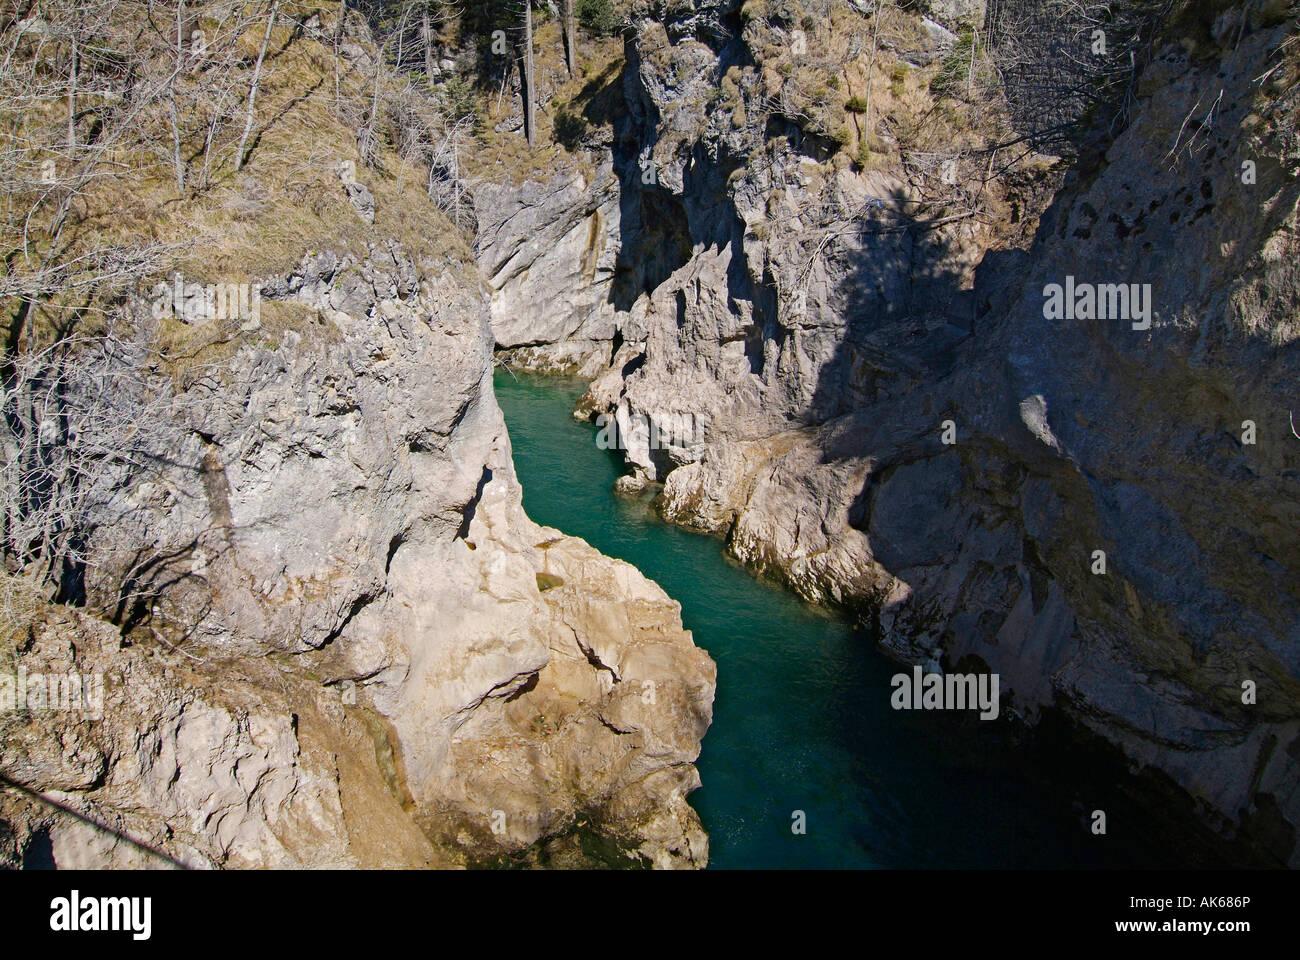 River Lech - Stock Image